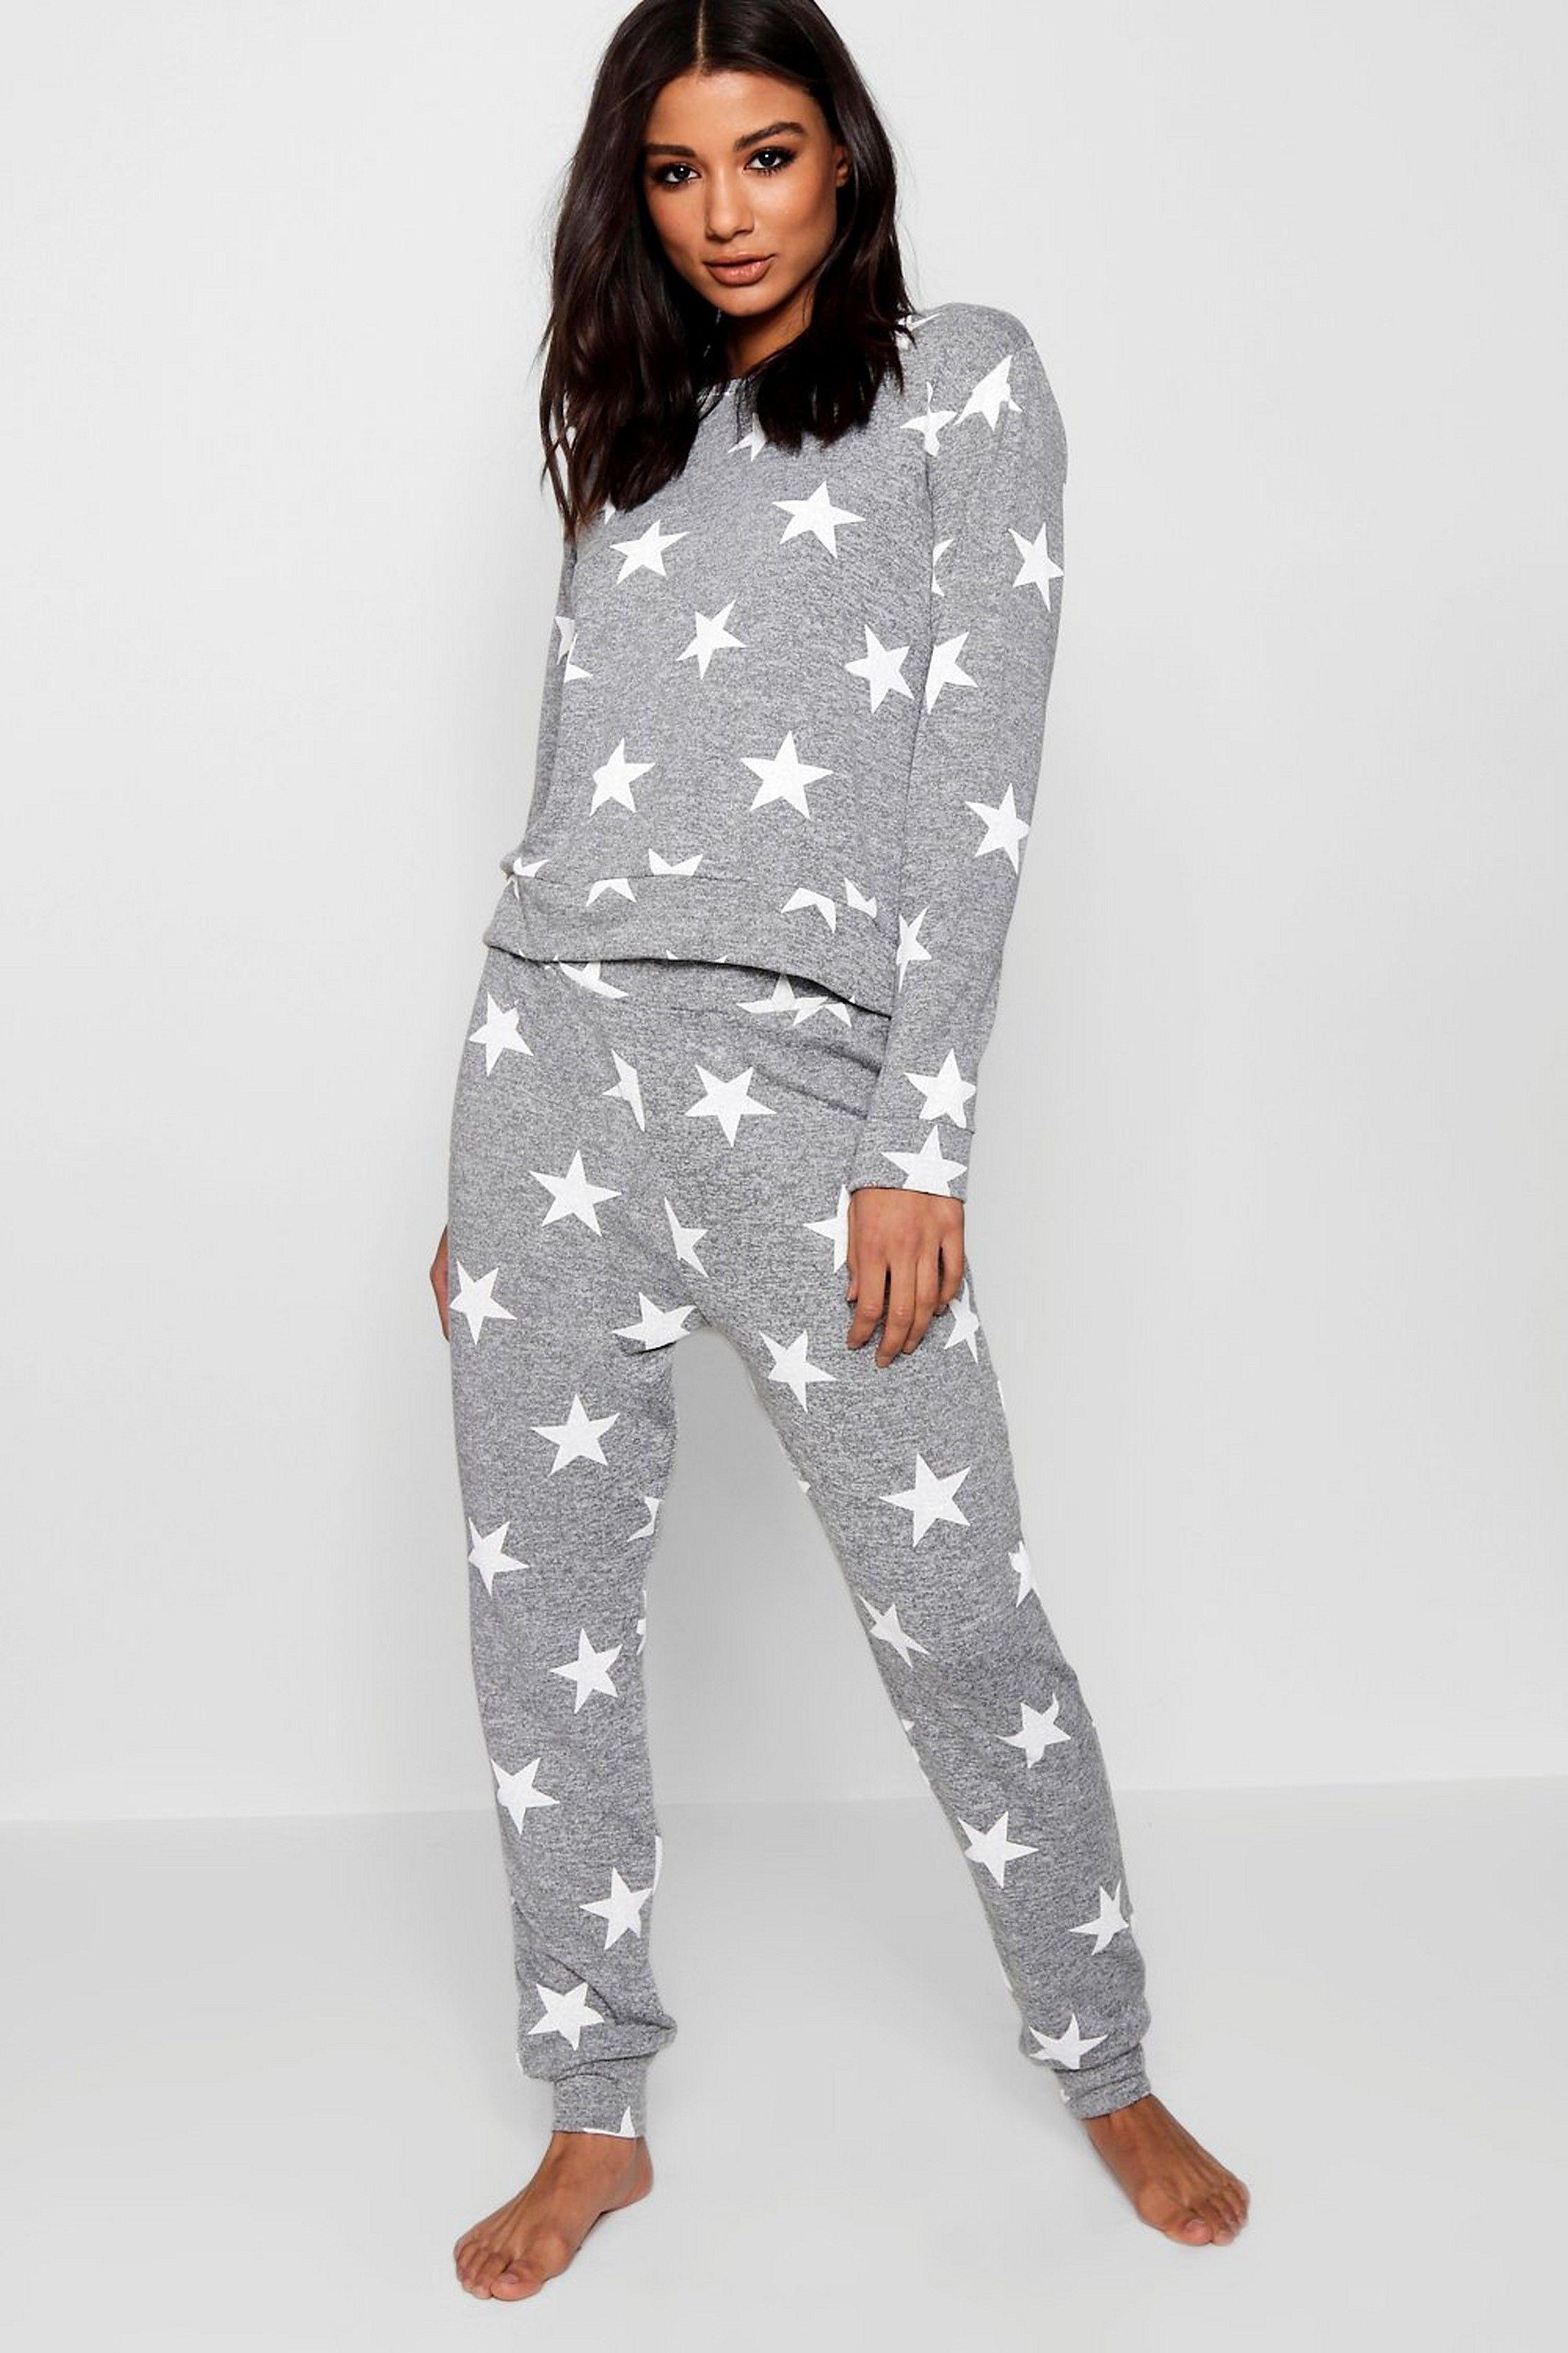 New Ladies Women Tracksuit Star Print Sweatshirt Joggers Pant Lounge-wear Set